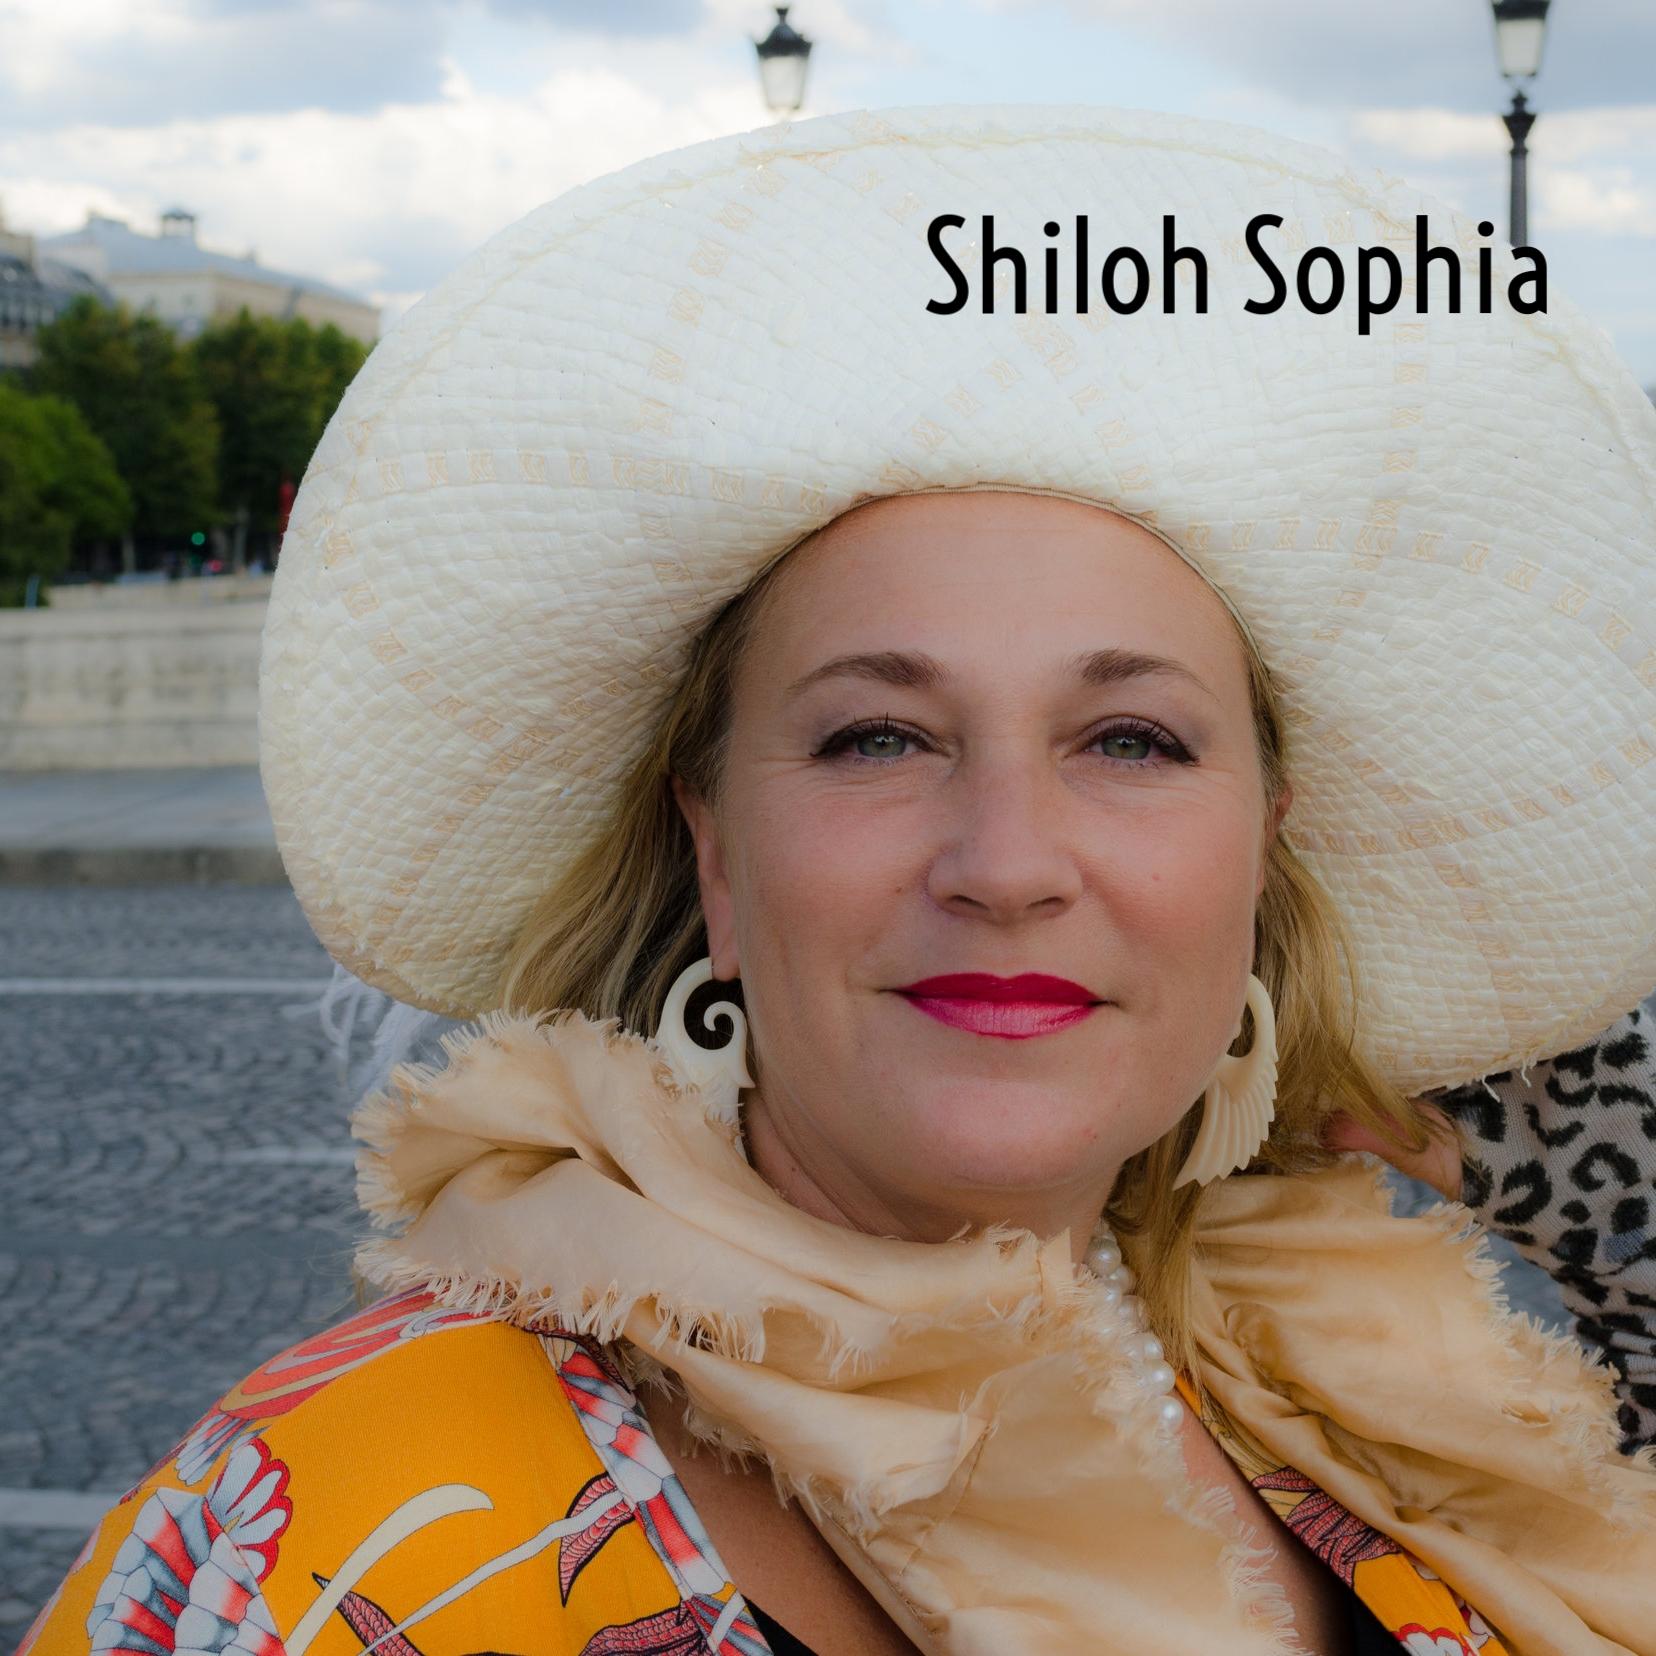 Shiloh Sophia